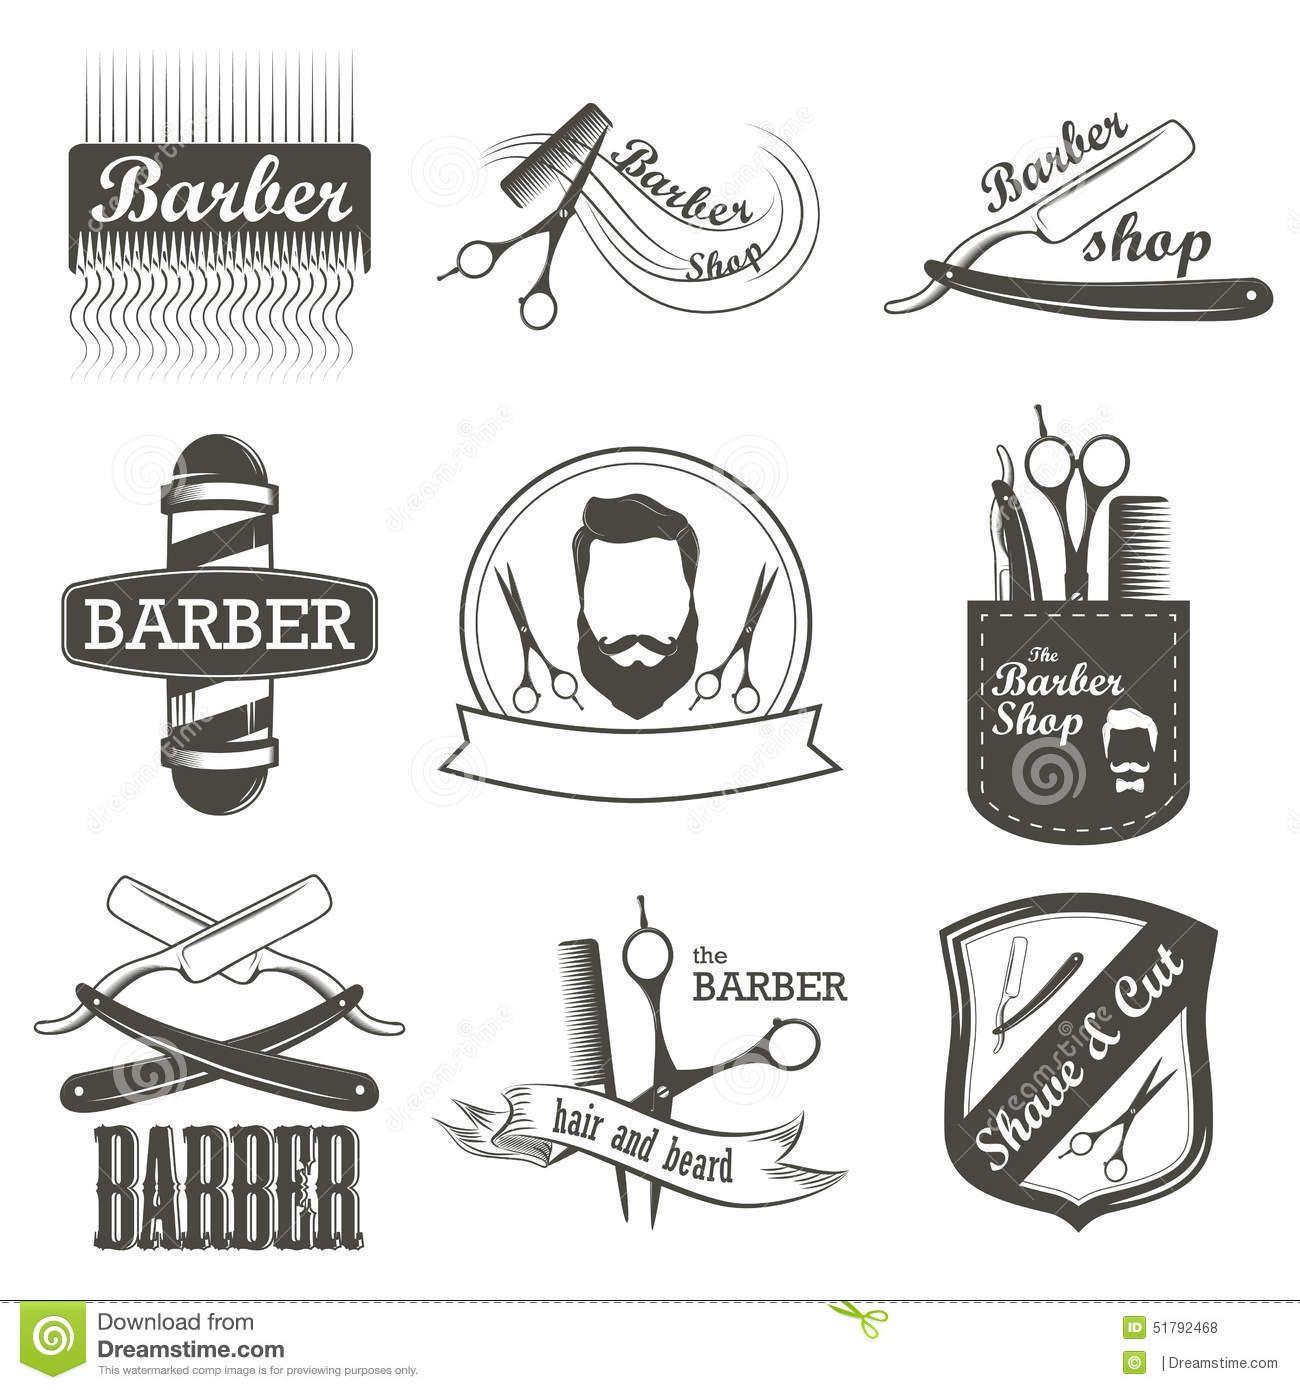 Http Thumbs Dreamstime Com Z Set Vintage Barber Shop Logo Labels Badges Emblems Label Designed Elements Ideias Para Barbearias Elementos De Design Barbeiros